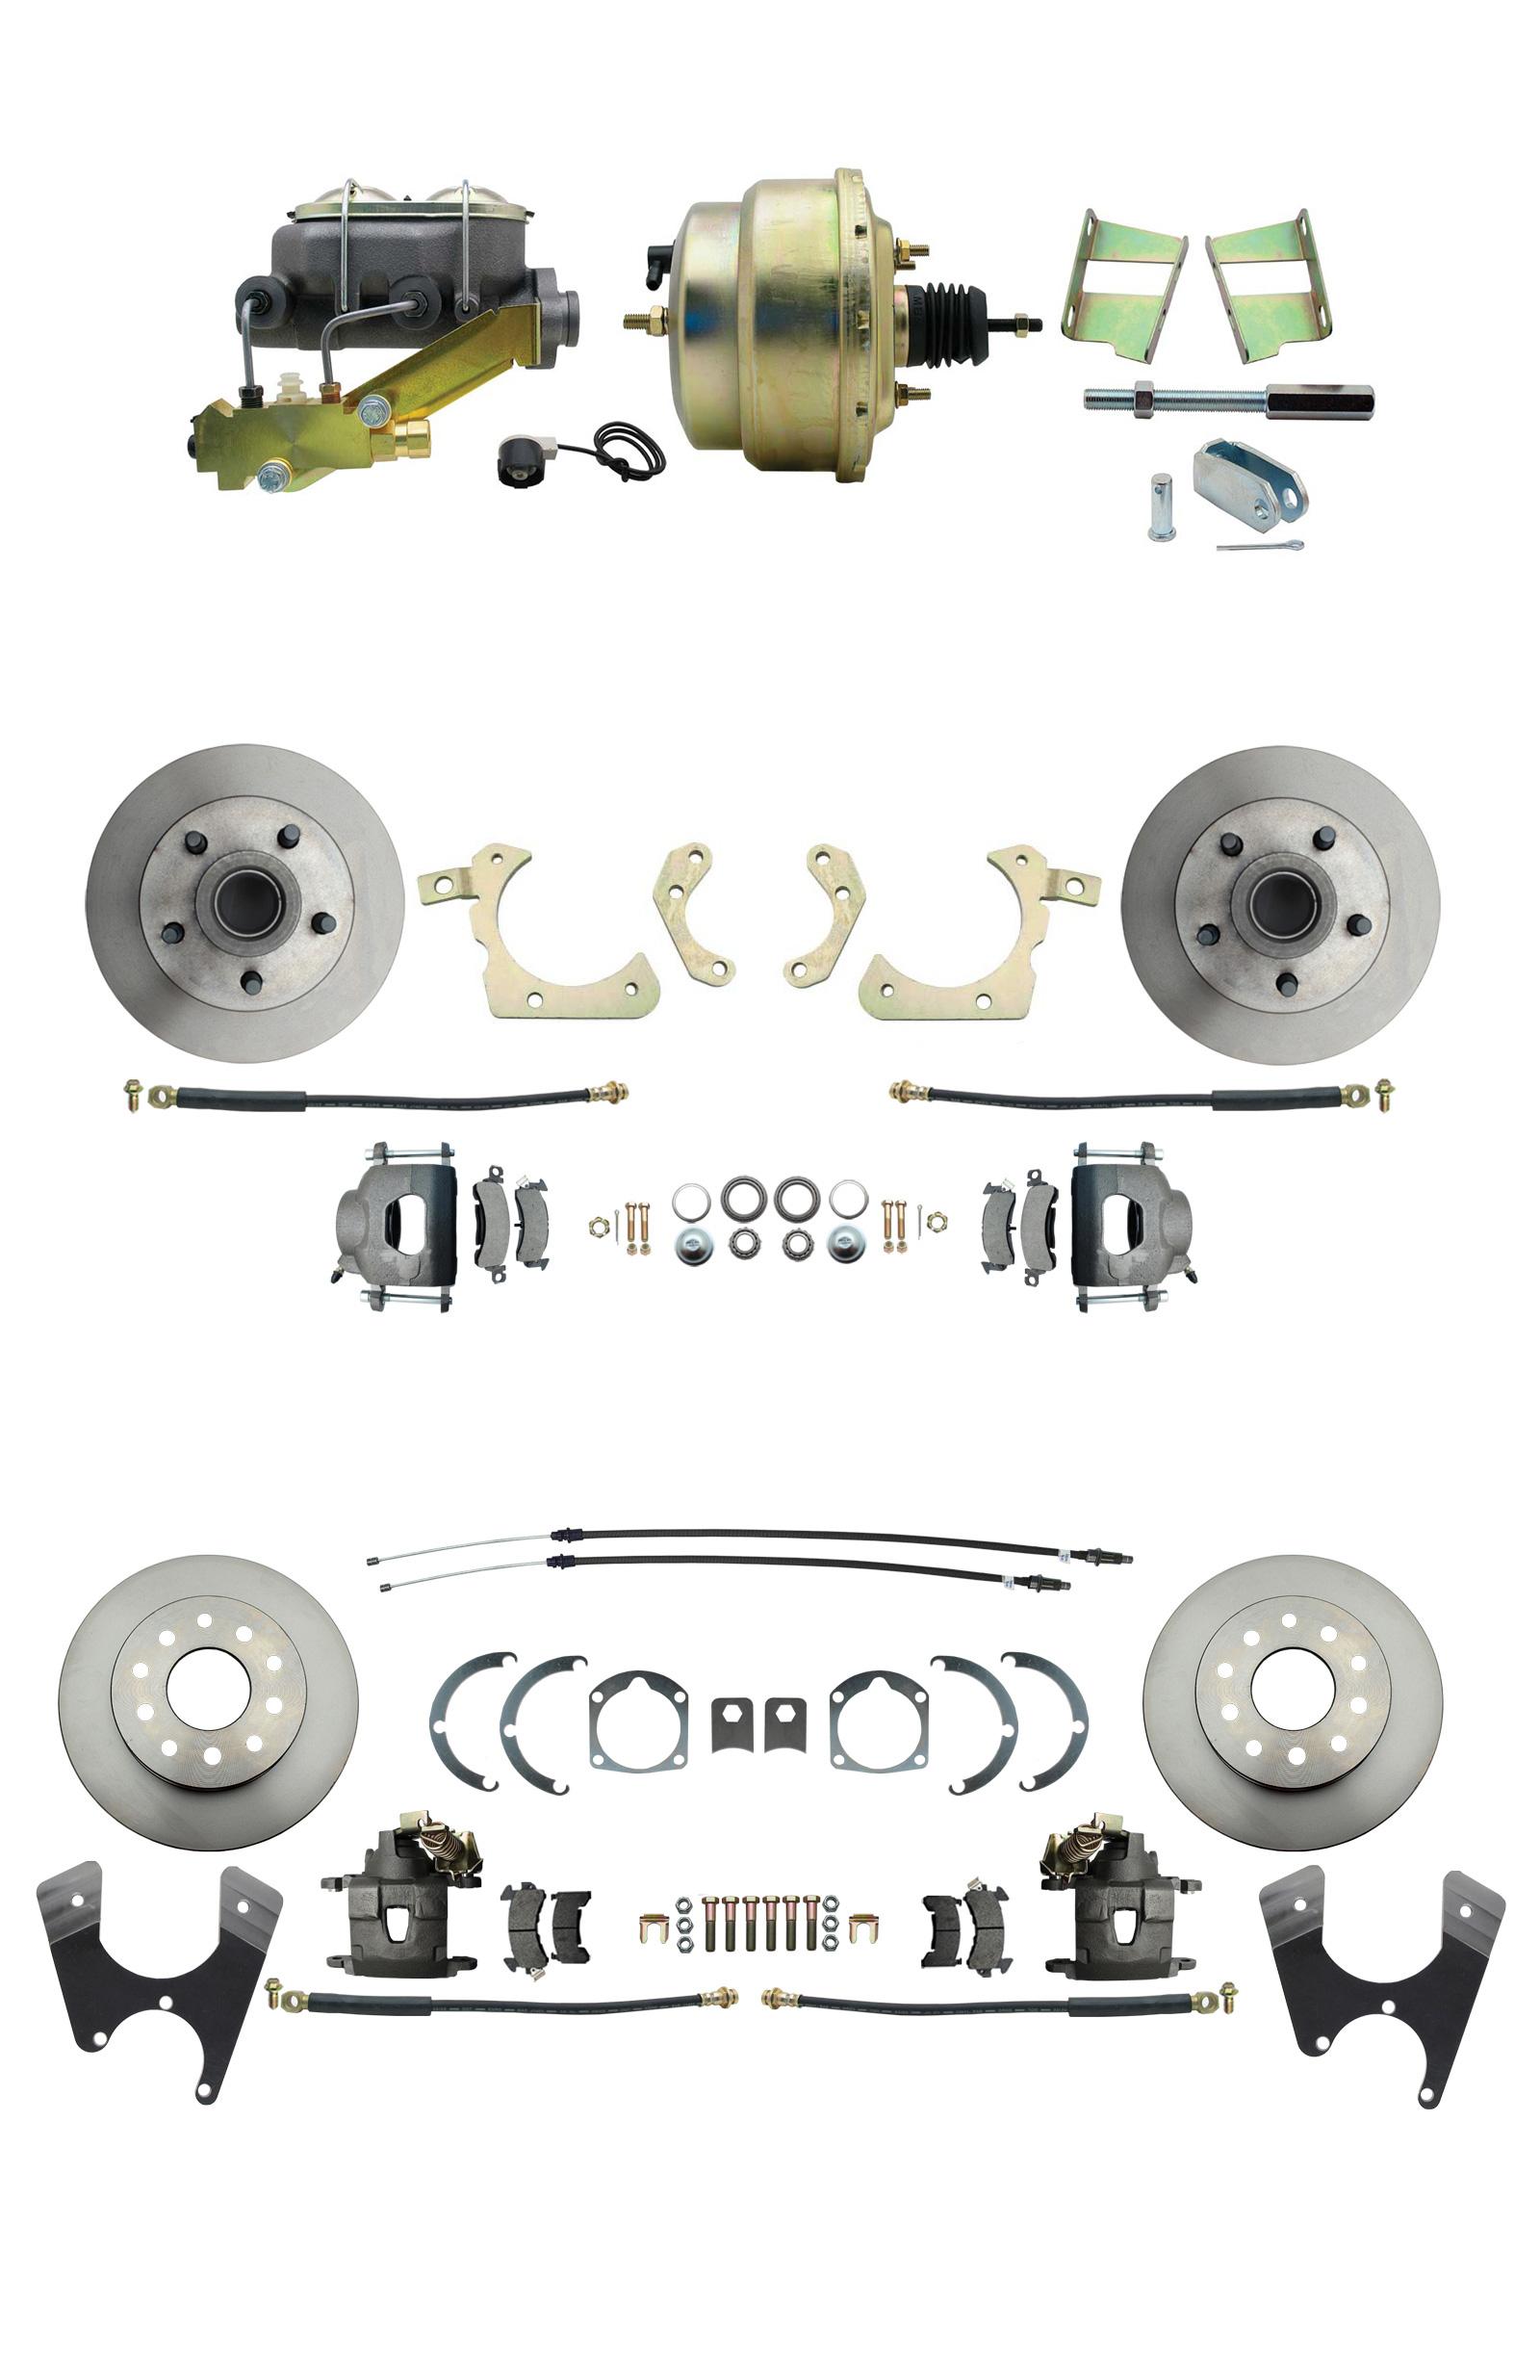 1959-1964 GM Full Size Front & Rear Power Disc Brake Kit (Impala, Bel Air, Biscayne) & 8 Dual Zinc Booster Conversion Kit W/ Cast Iron Master Cylinder Left Mount Disc/ Drum Proportioning Valve Kit